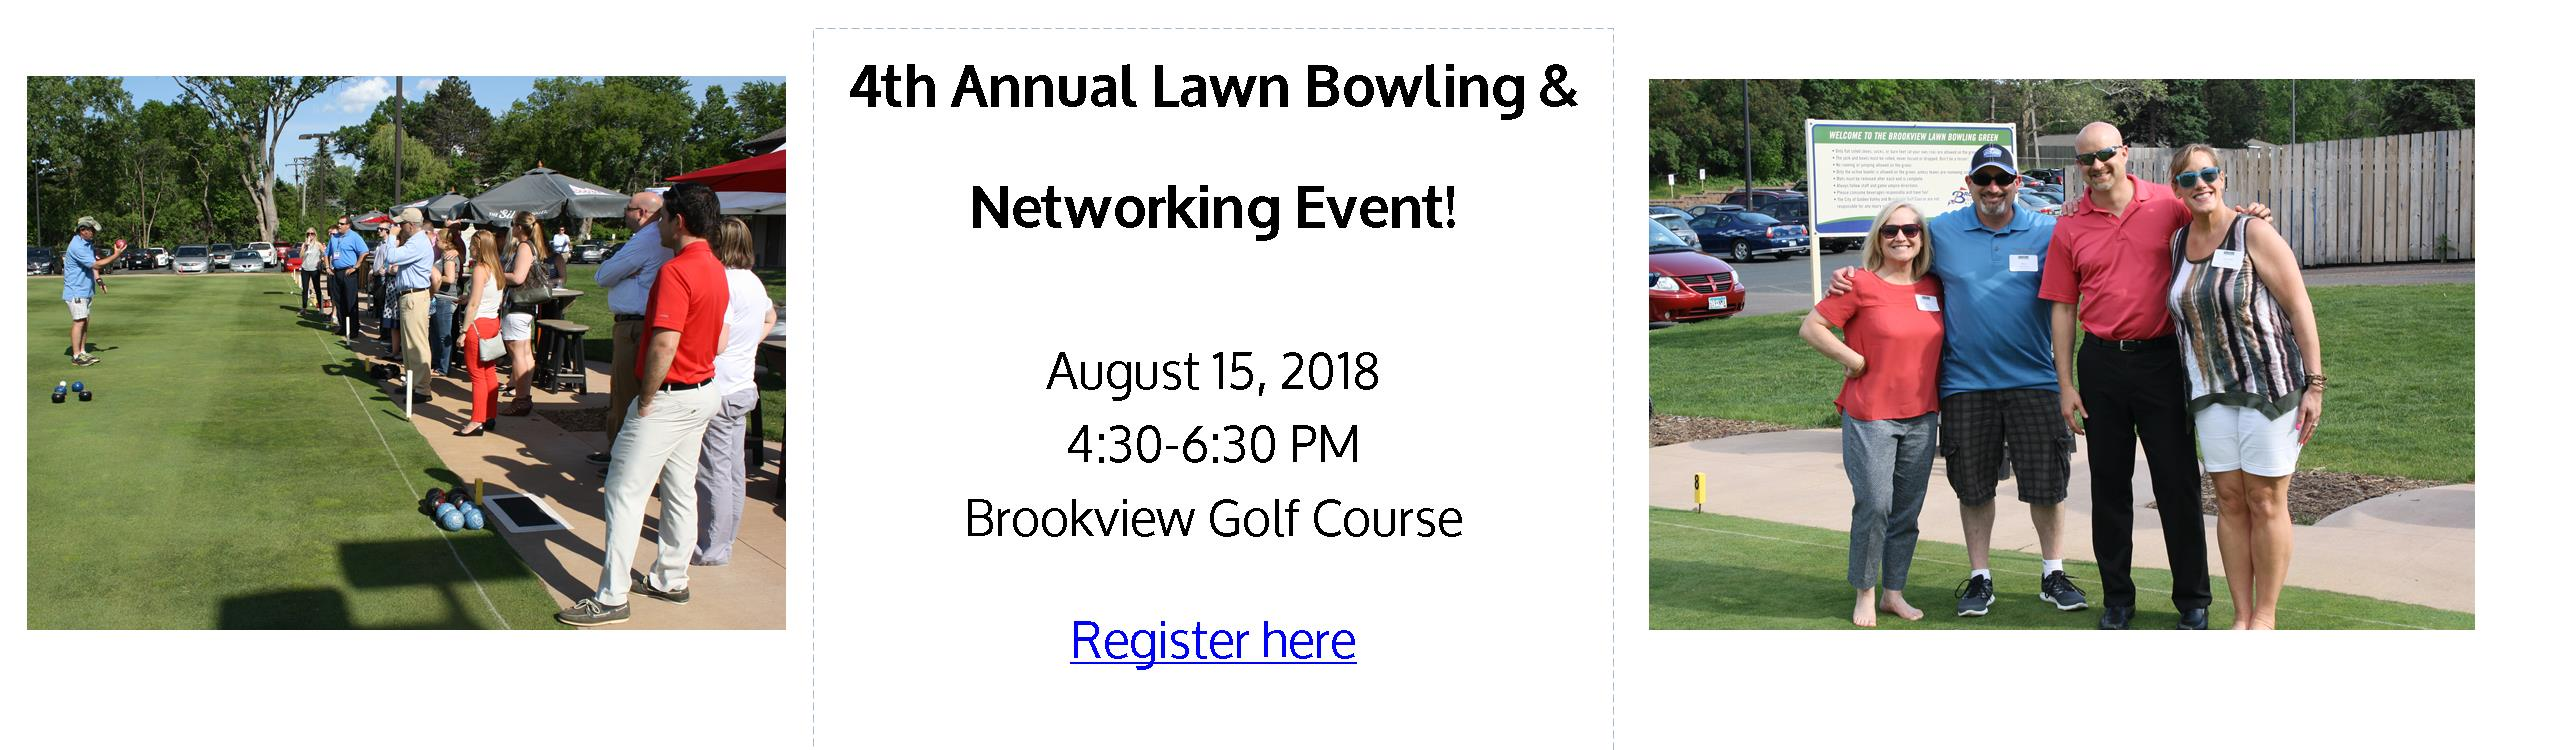 Lawn-Bowling.2018.jpg